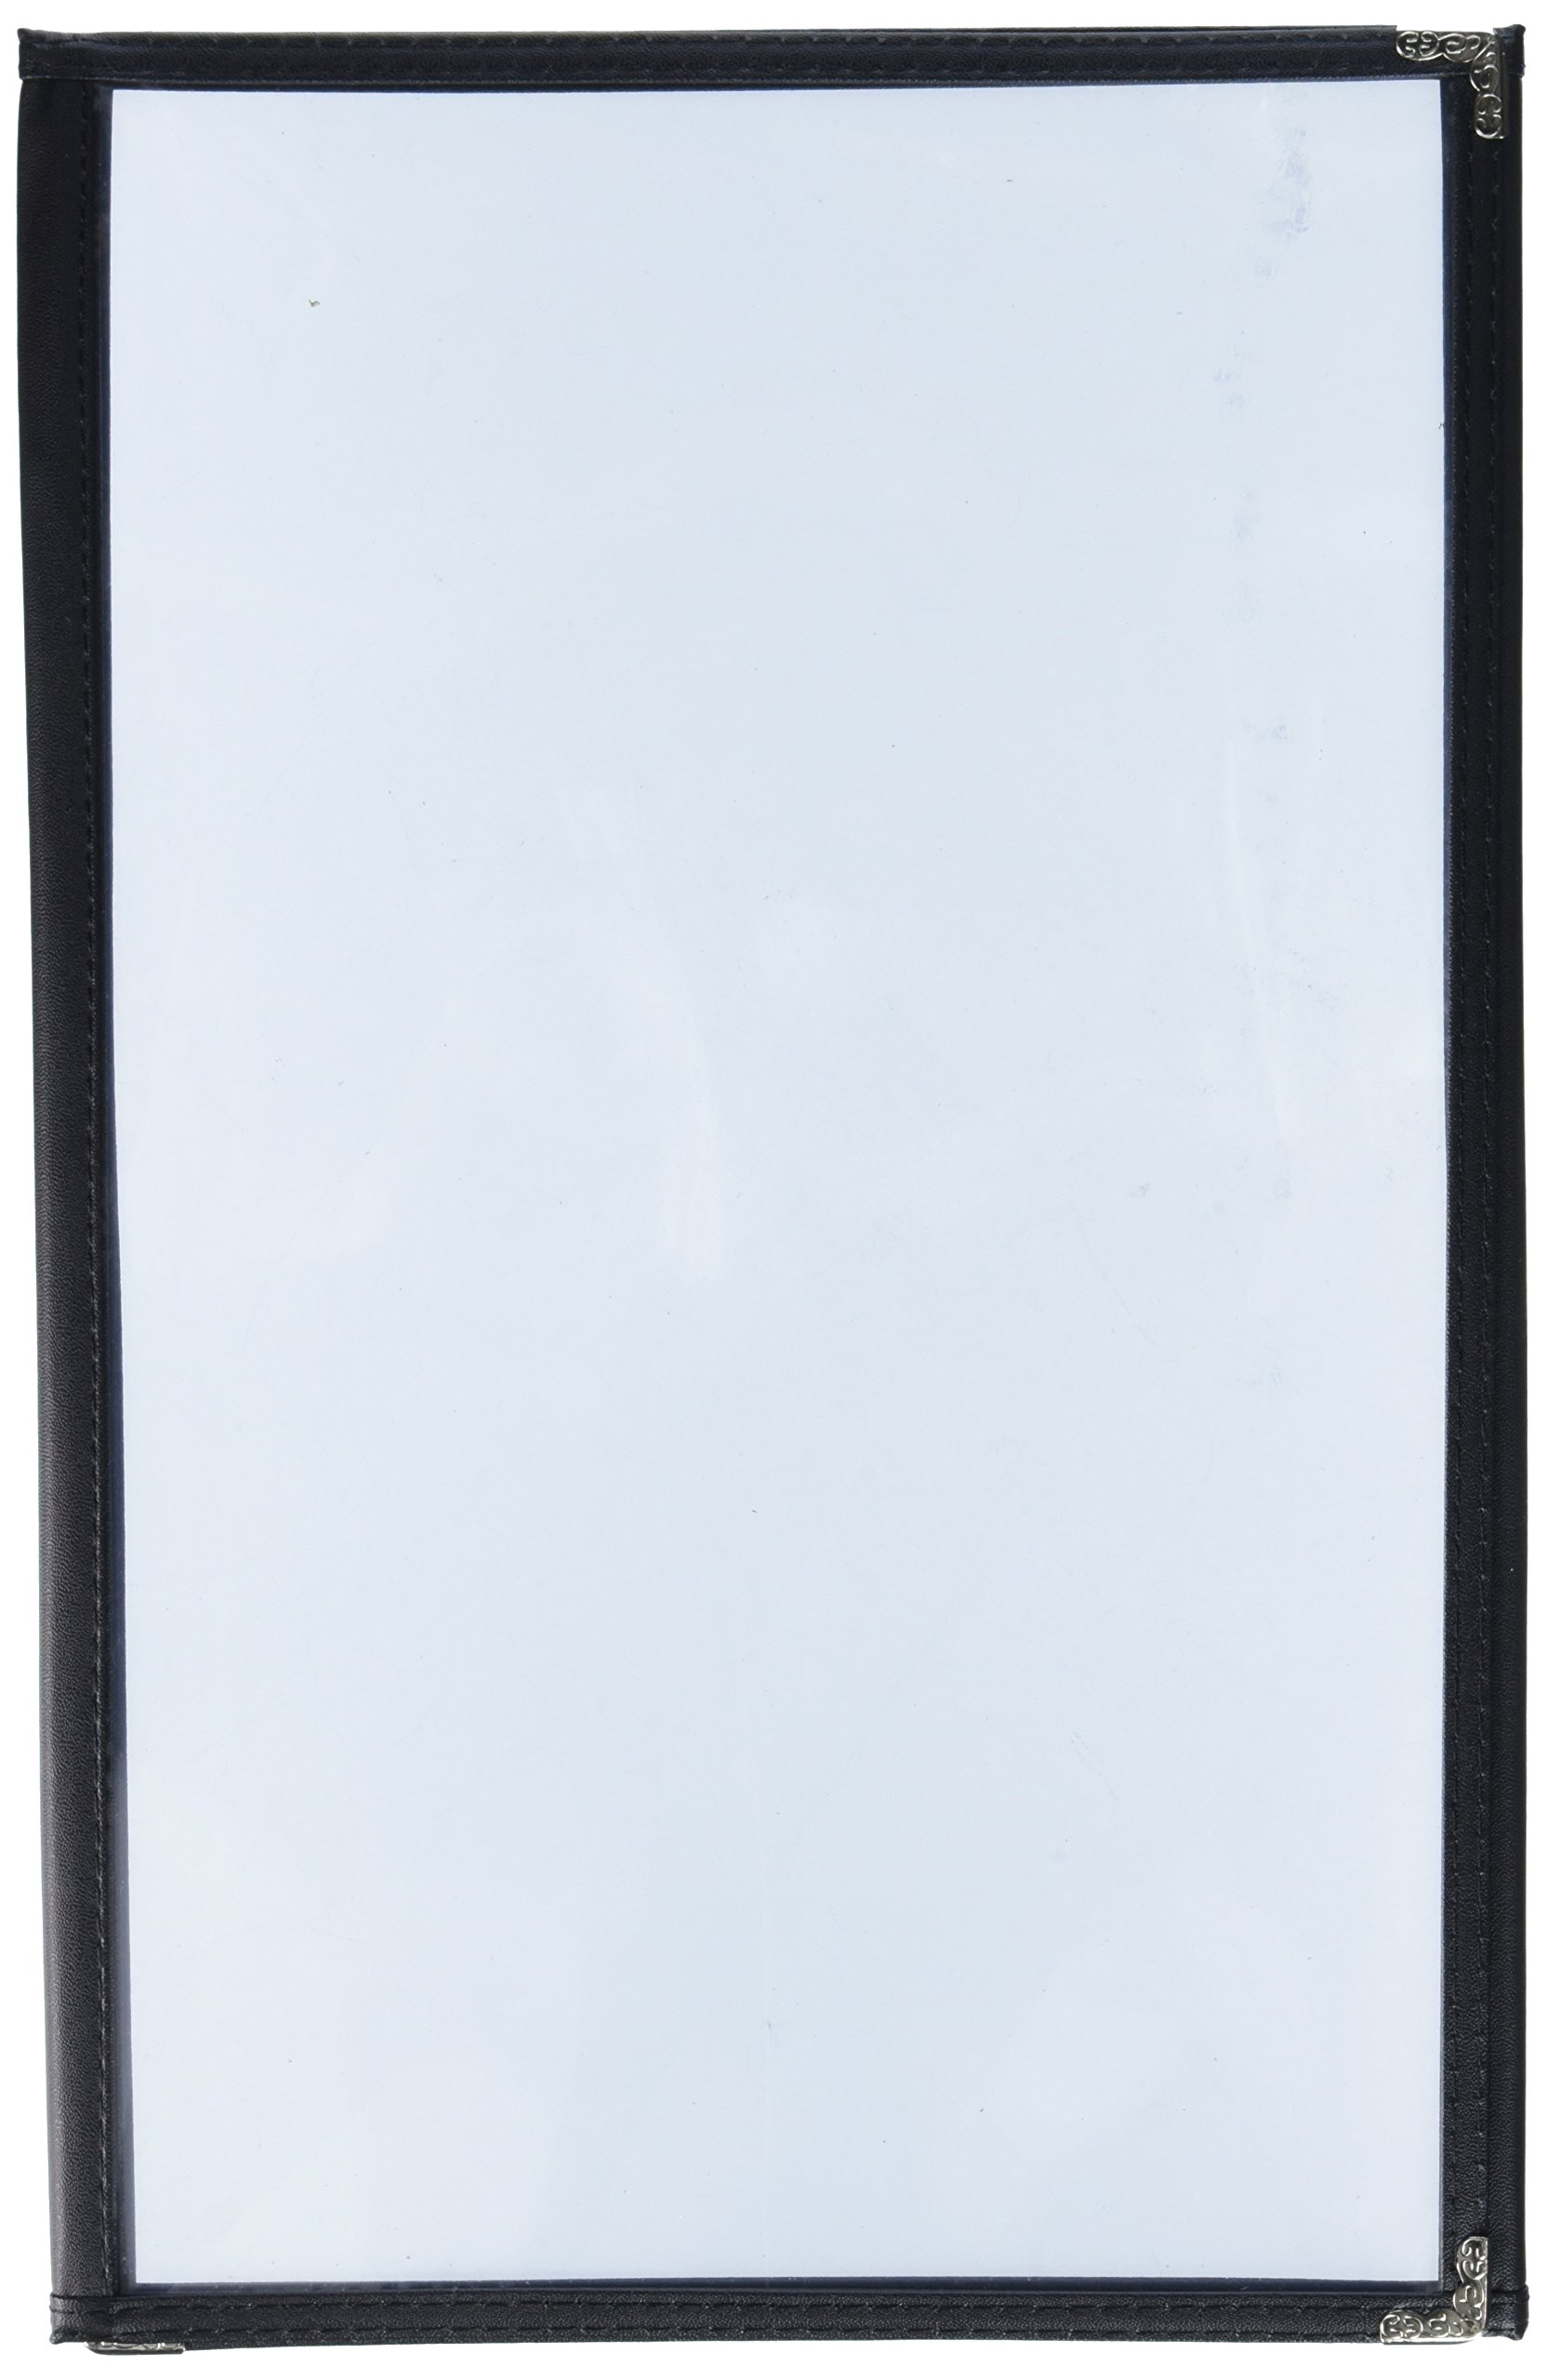 Displays2go TPCMUFDR14 Tri-Fold Menu Covers (Set of 10), 8.5 x 14